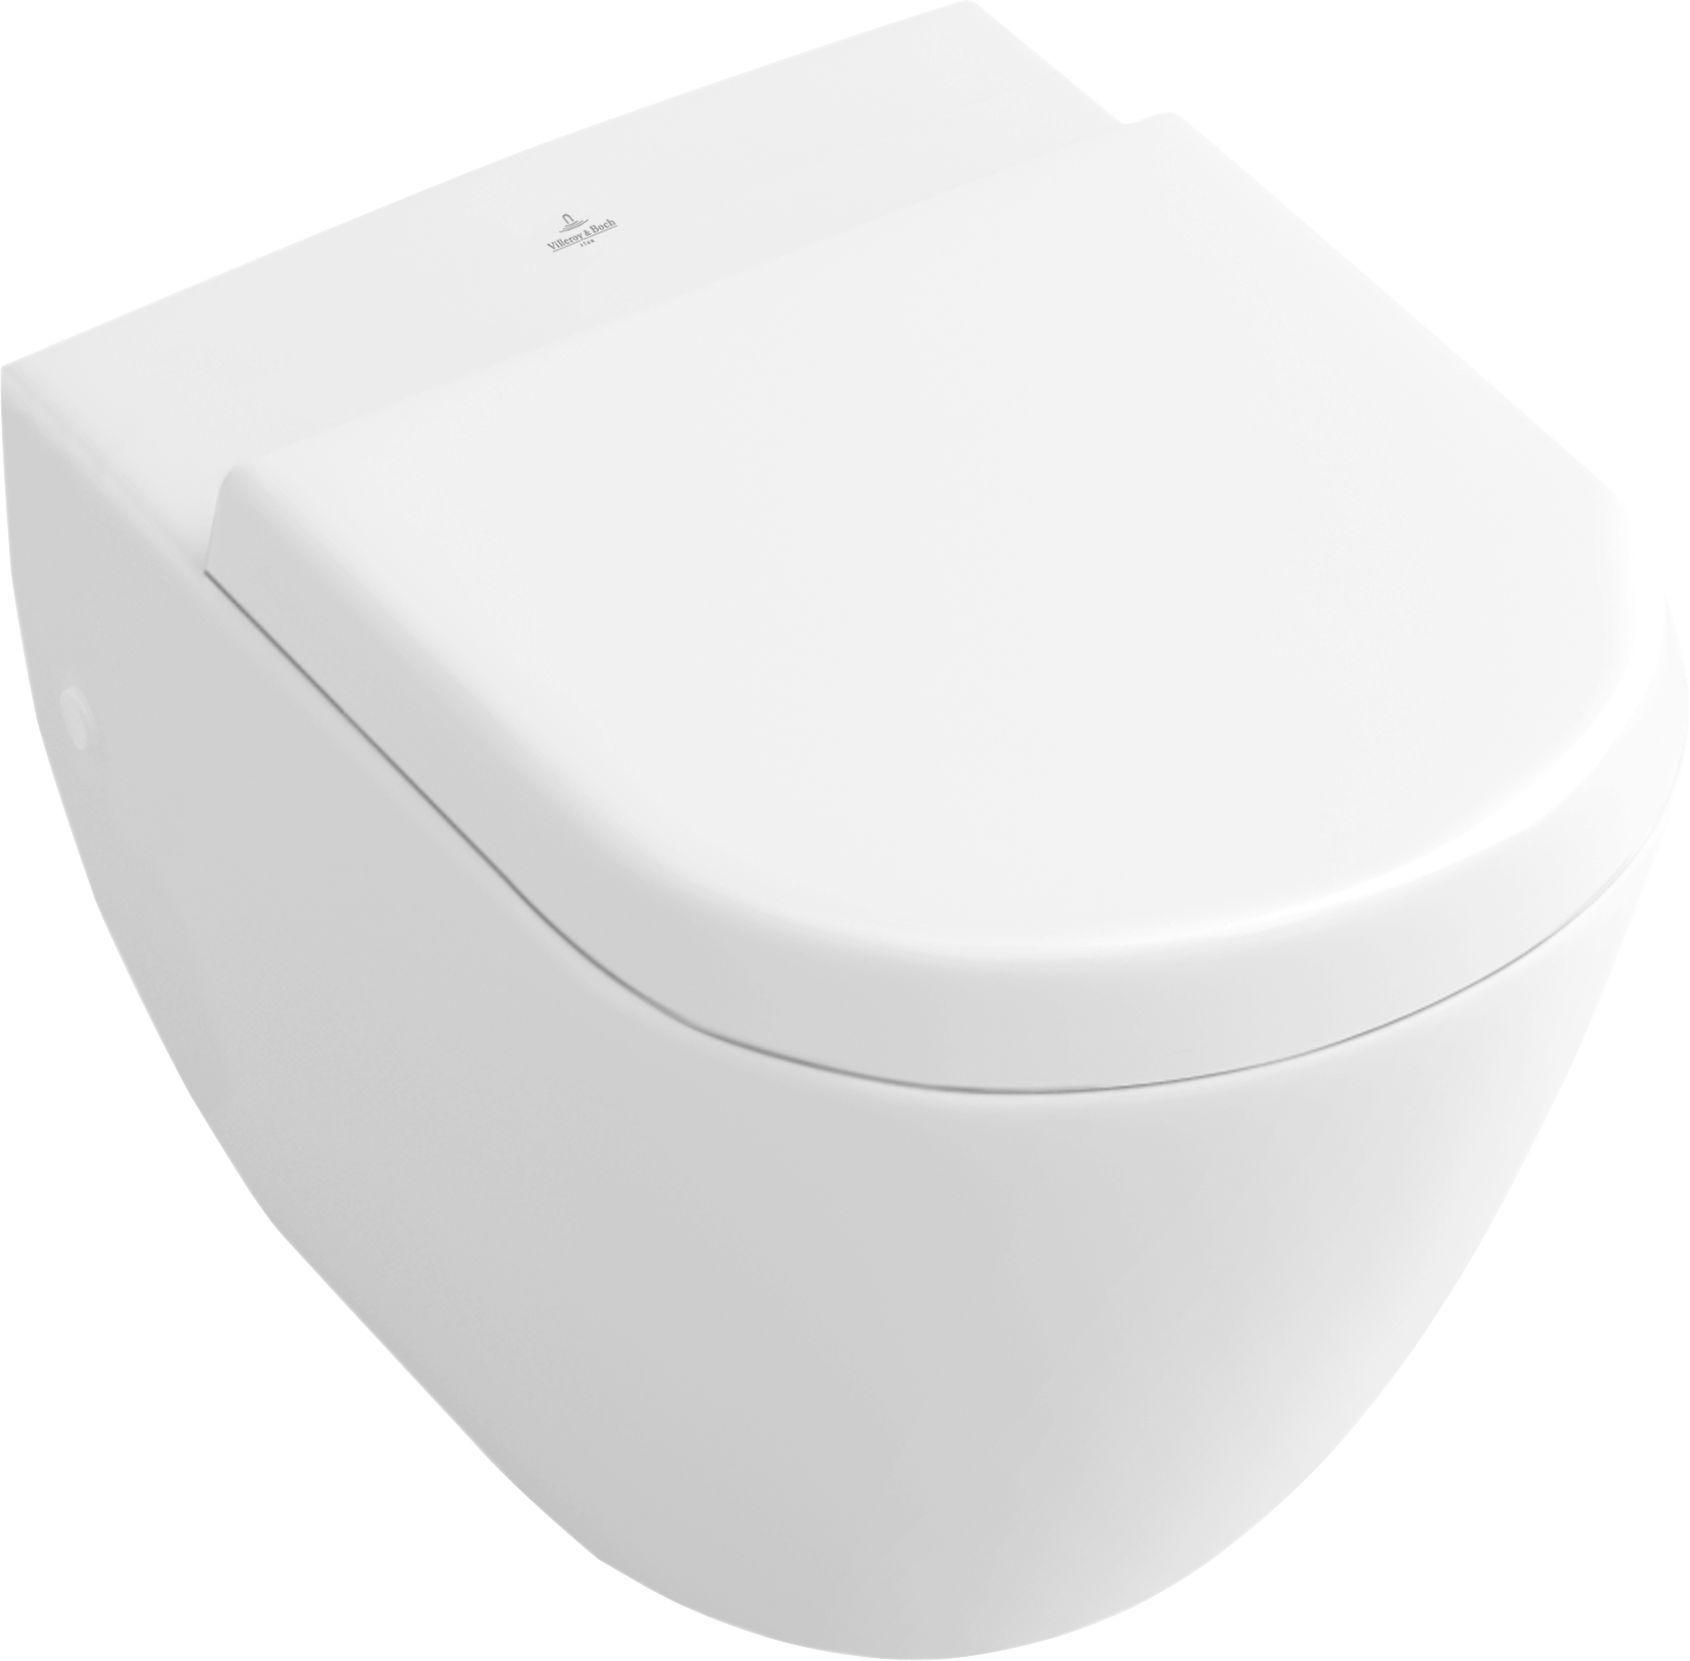 Villeroy & Boch Subway Compact Tiefspül-Wand-WC L:48xB:35,5cm weiß mit Ceramicplus 660410R1